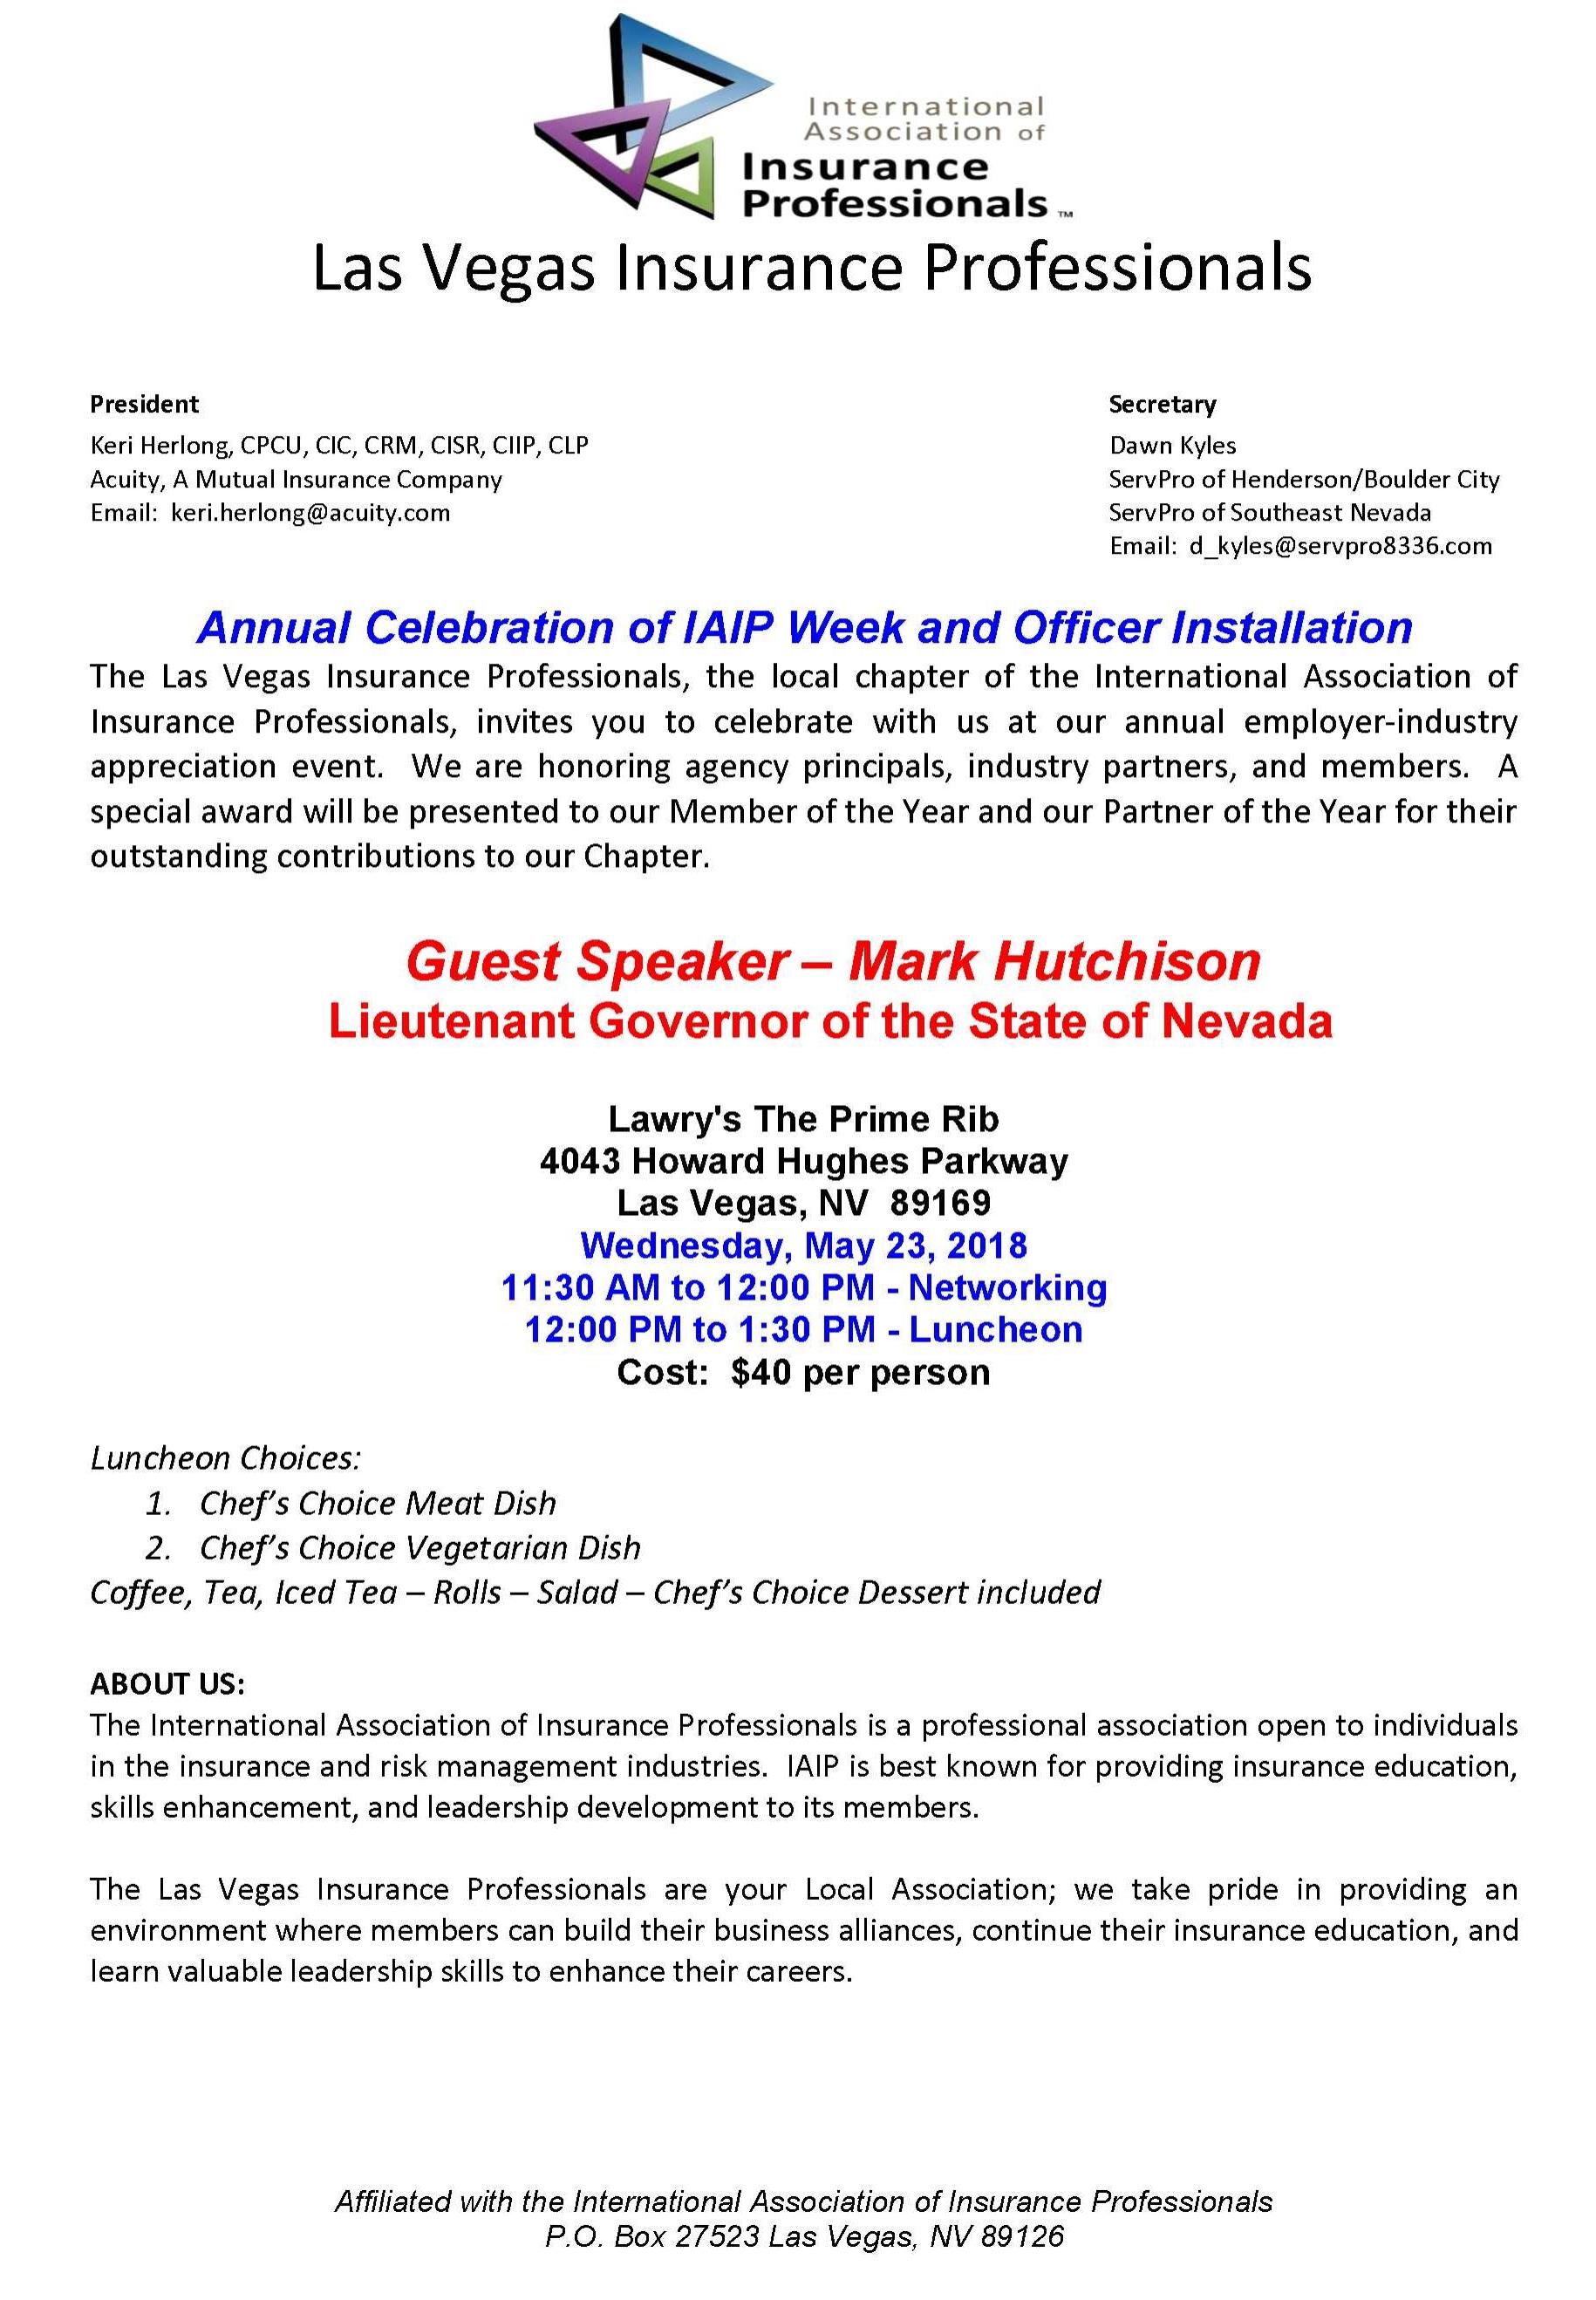 LVIP IAIP Week Invitation May 2018_1.jpg